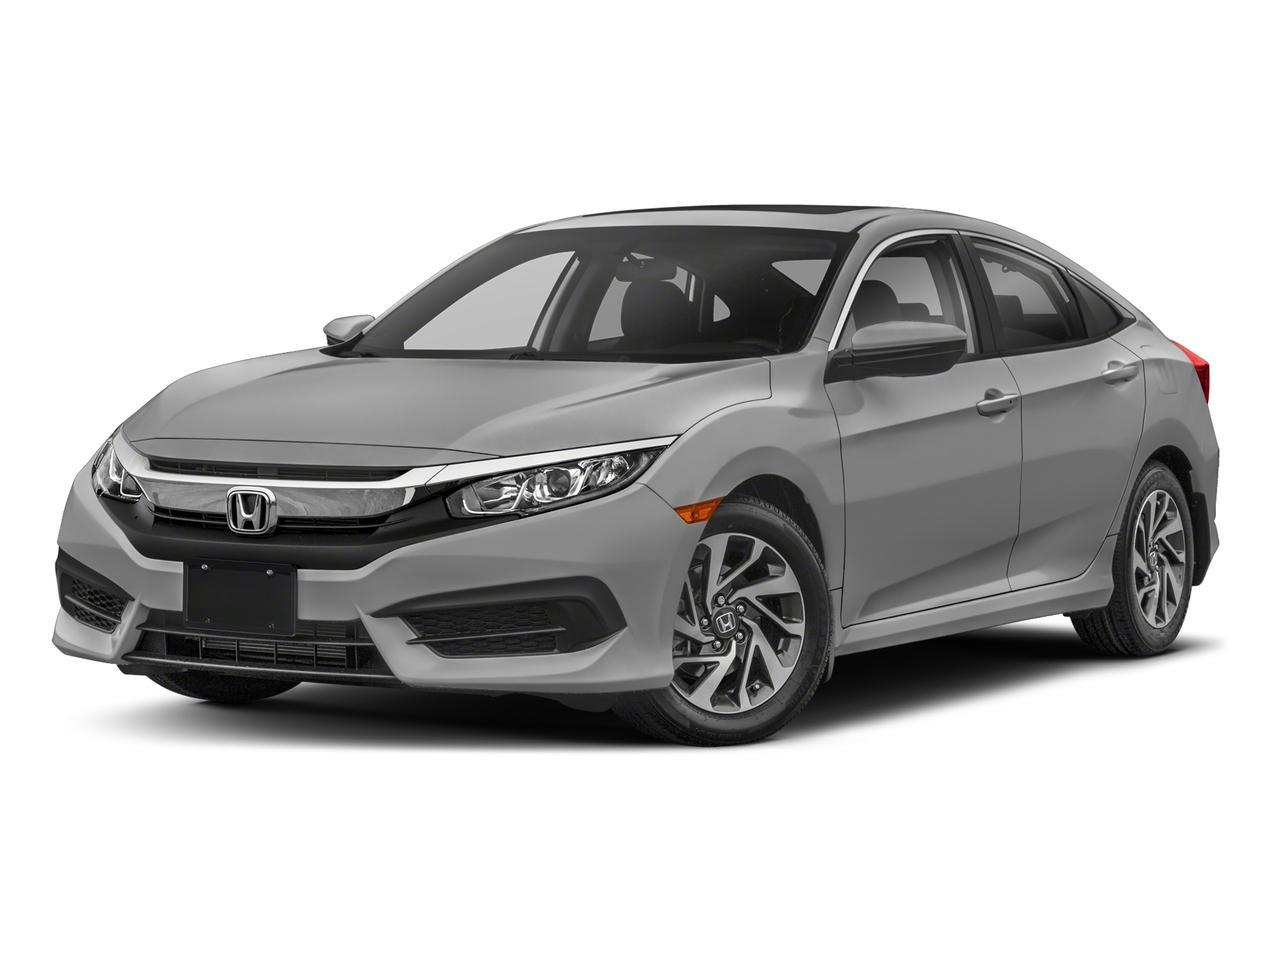 2018 Honda Civic Sedan Vehicle Photo in San Antonio, TX 78238